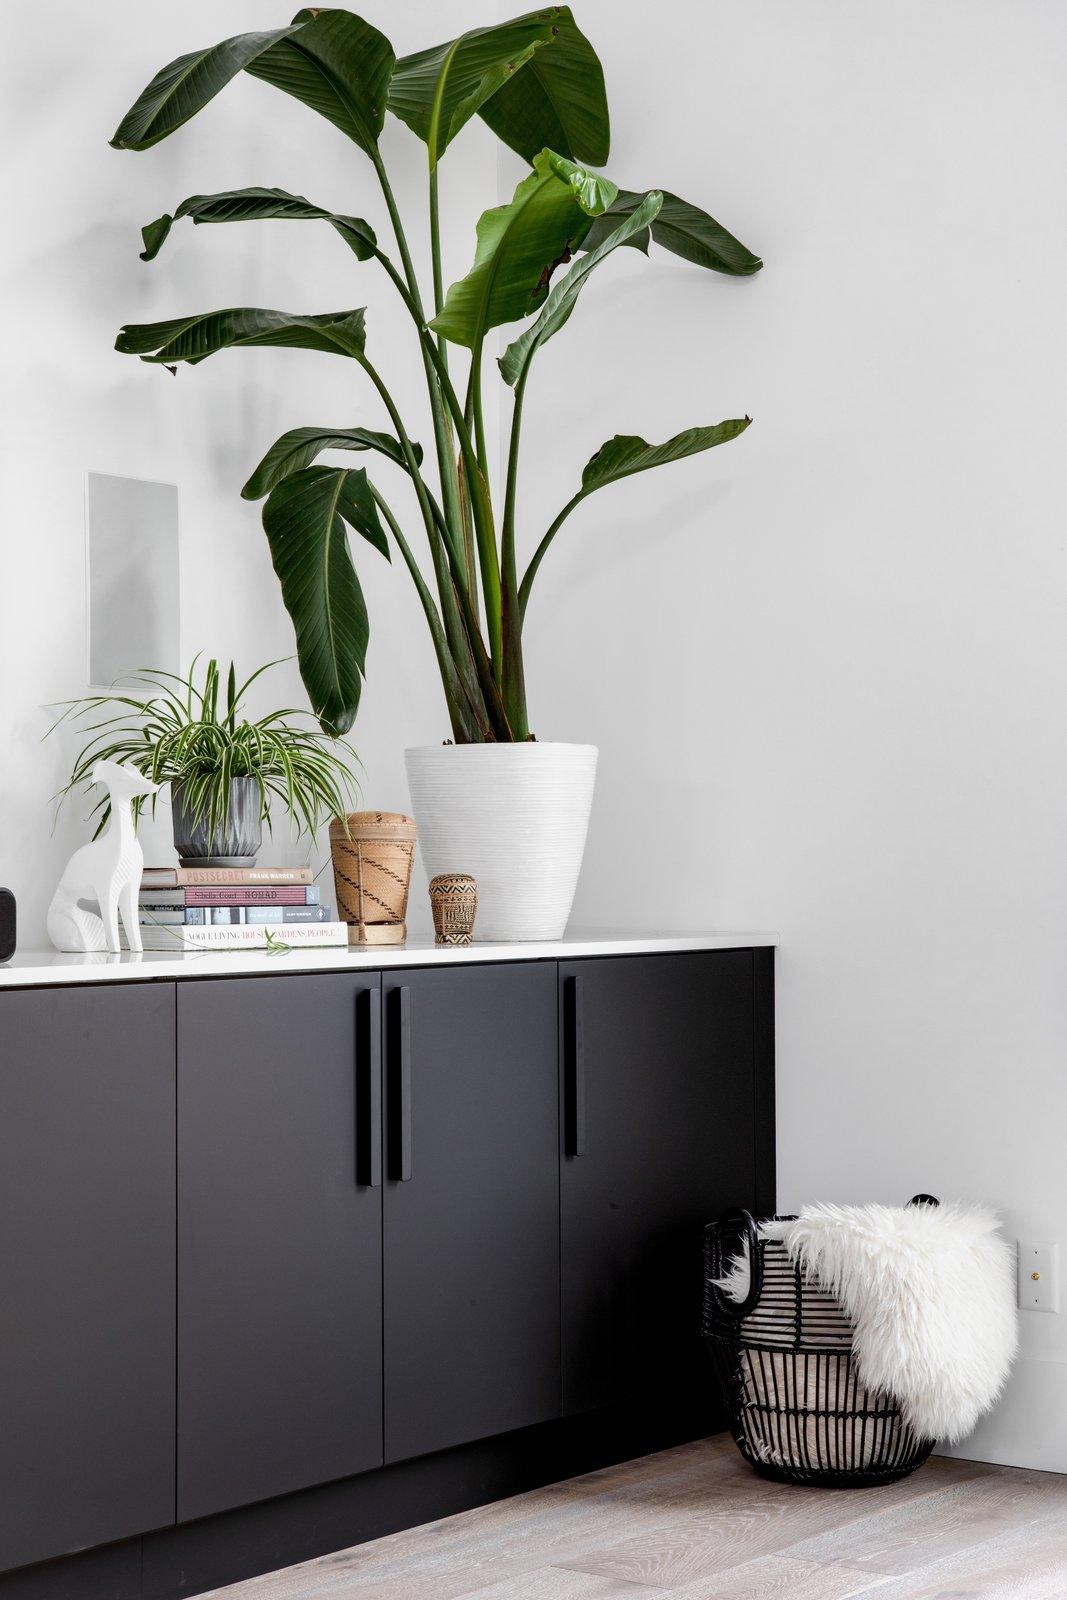 Living, Storage, Shelves, Media Cabinet, Medium Hardwood, and Ceiling  Best Living Medium Hardwood Storage Photos from Pleasant St. Urban Abode